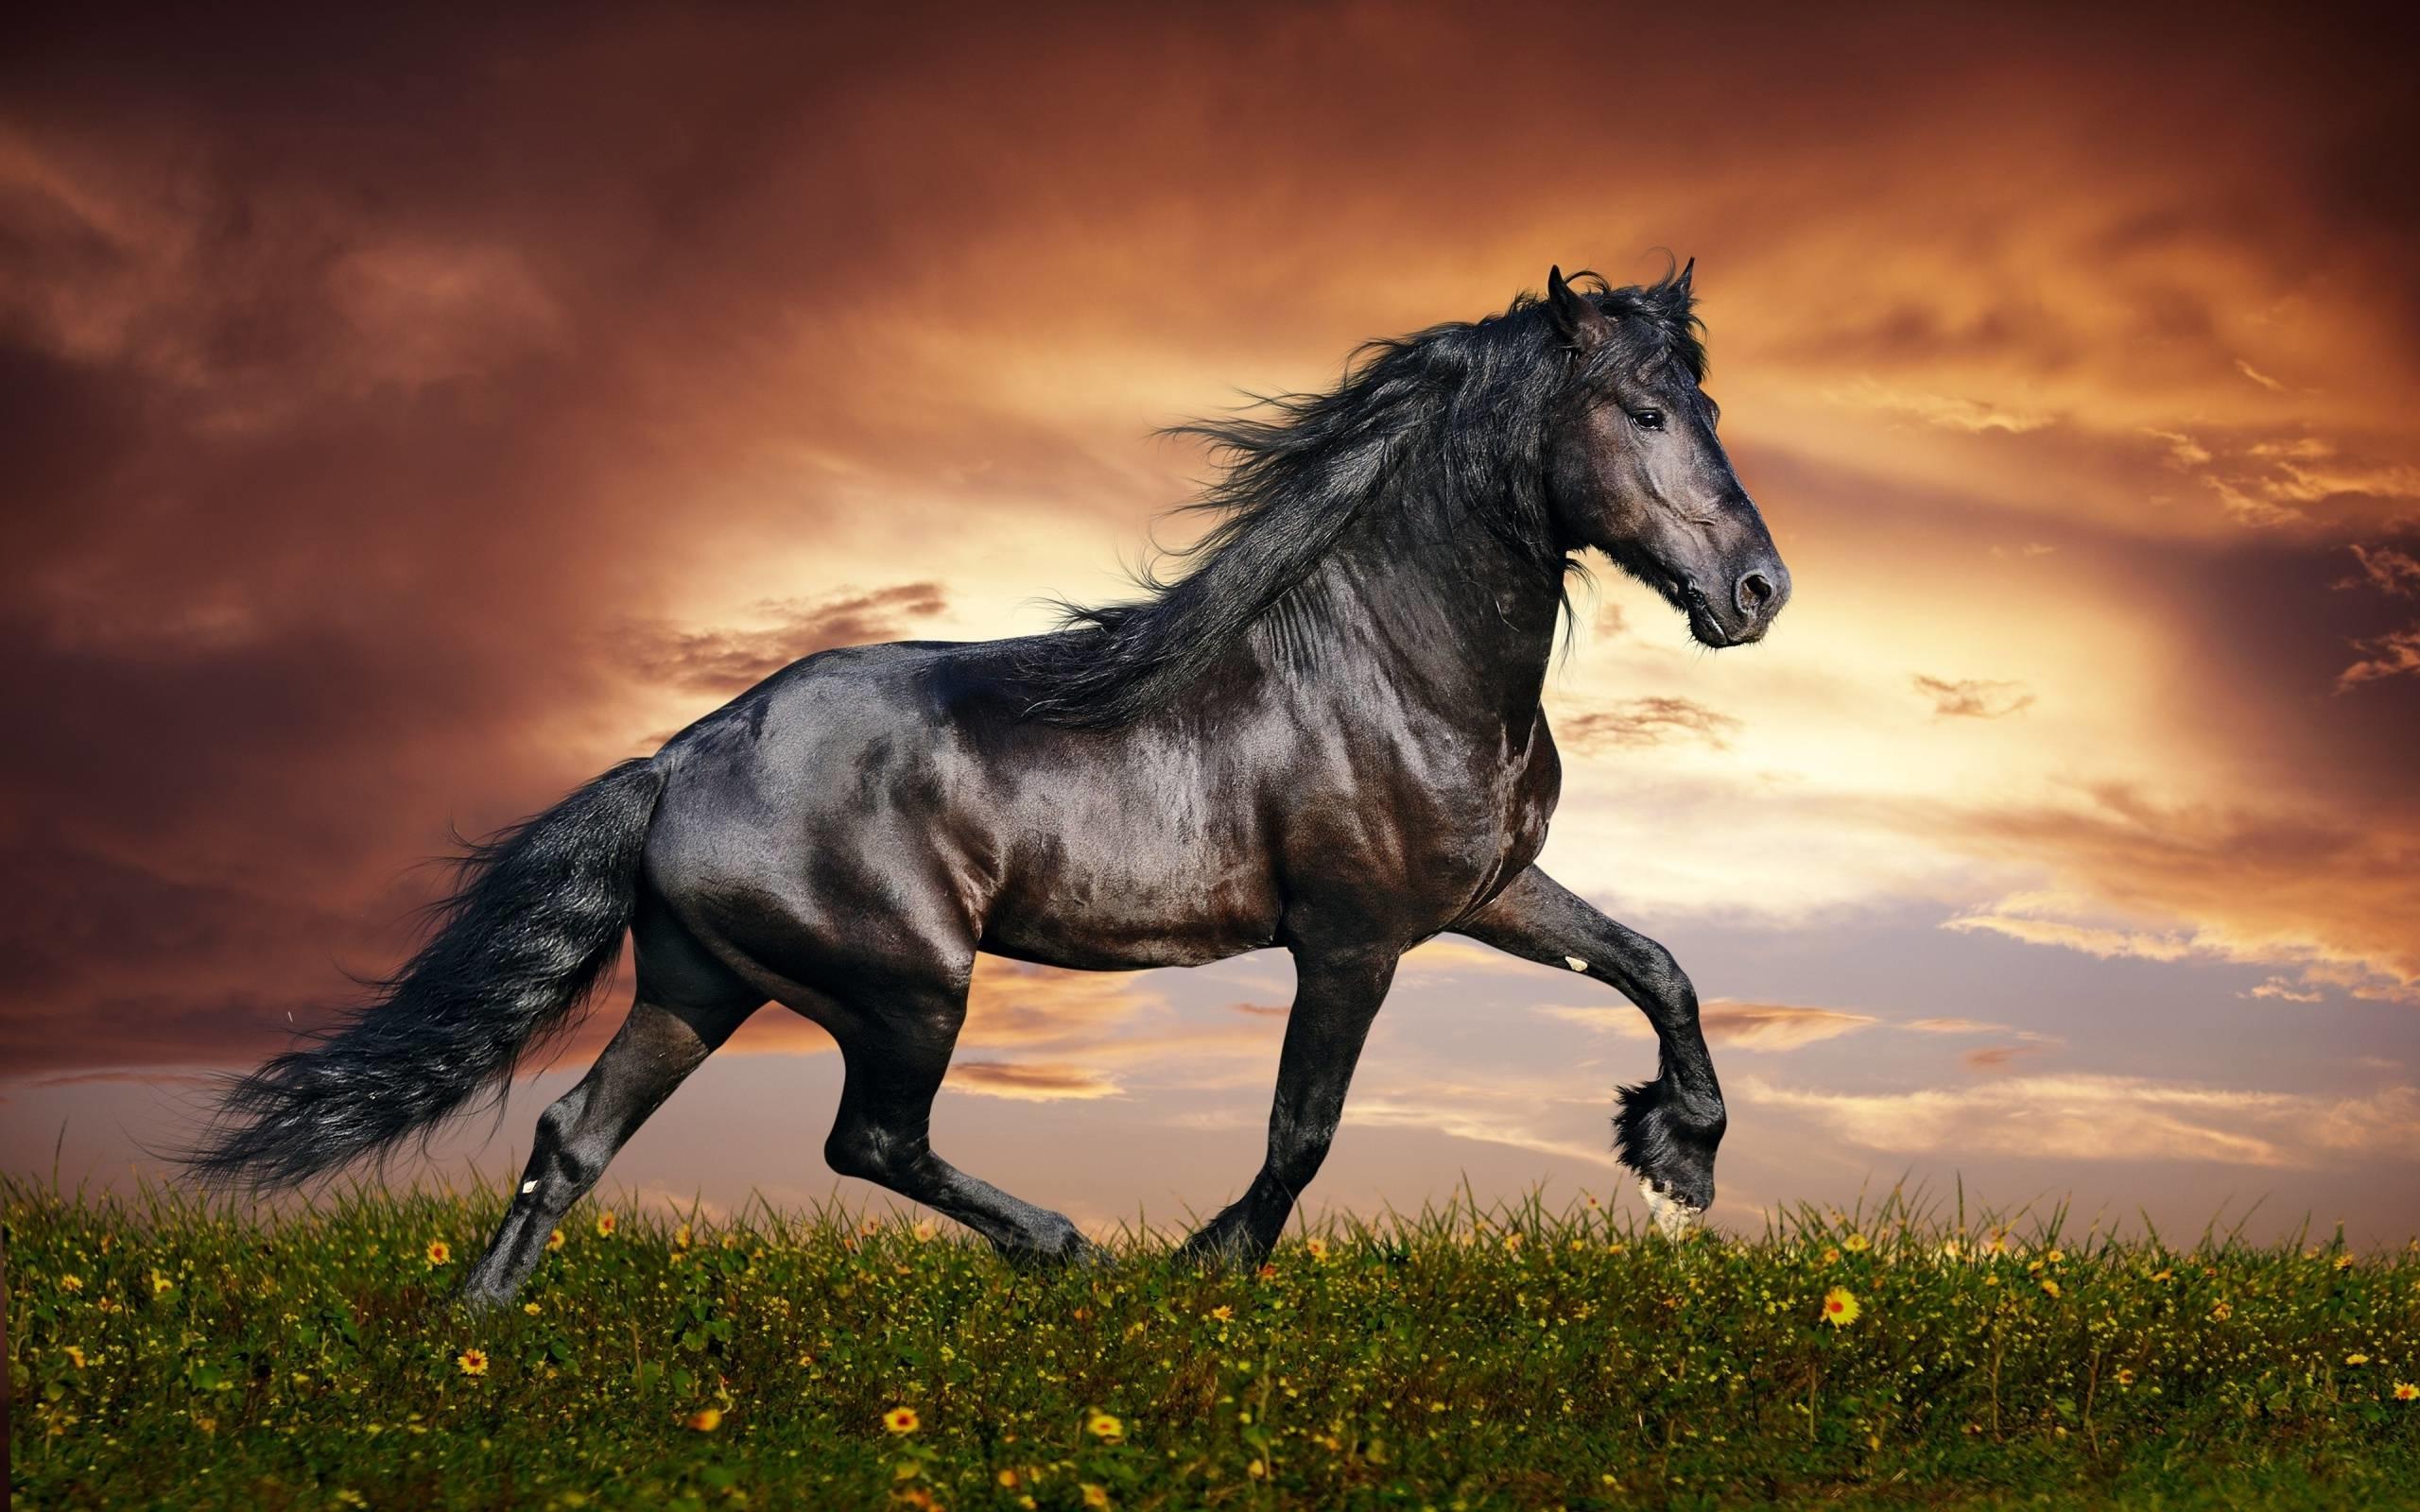 Wallpapers For > Black Arabian Horse Wallpaper